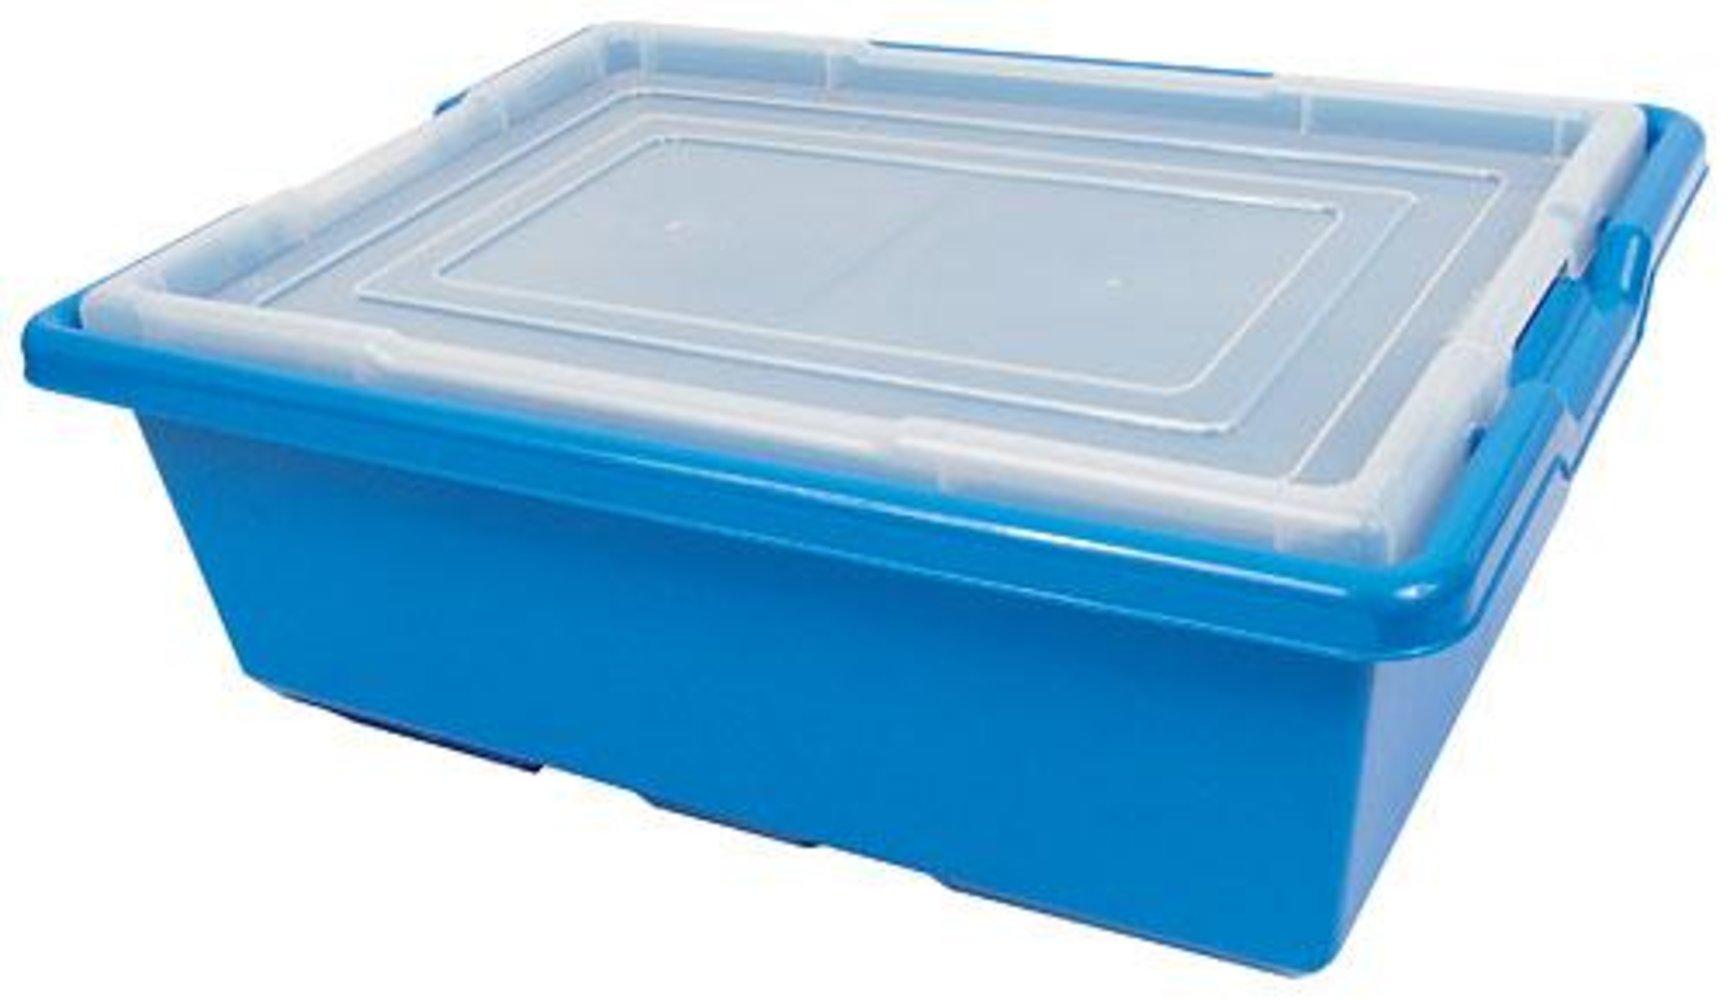 Medium Blue Storage Bin (16.5in x 12in x 6in)